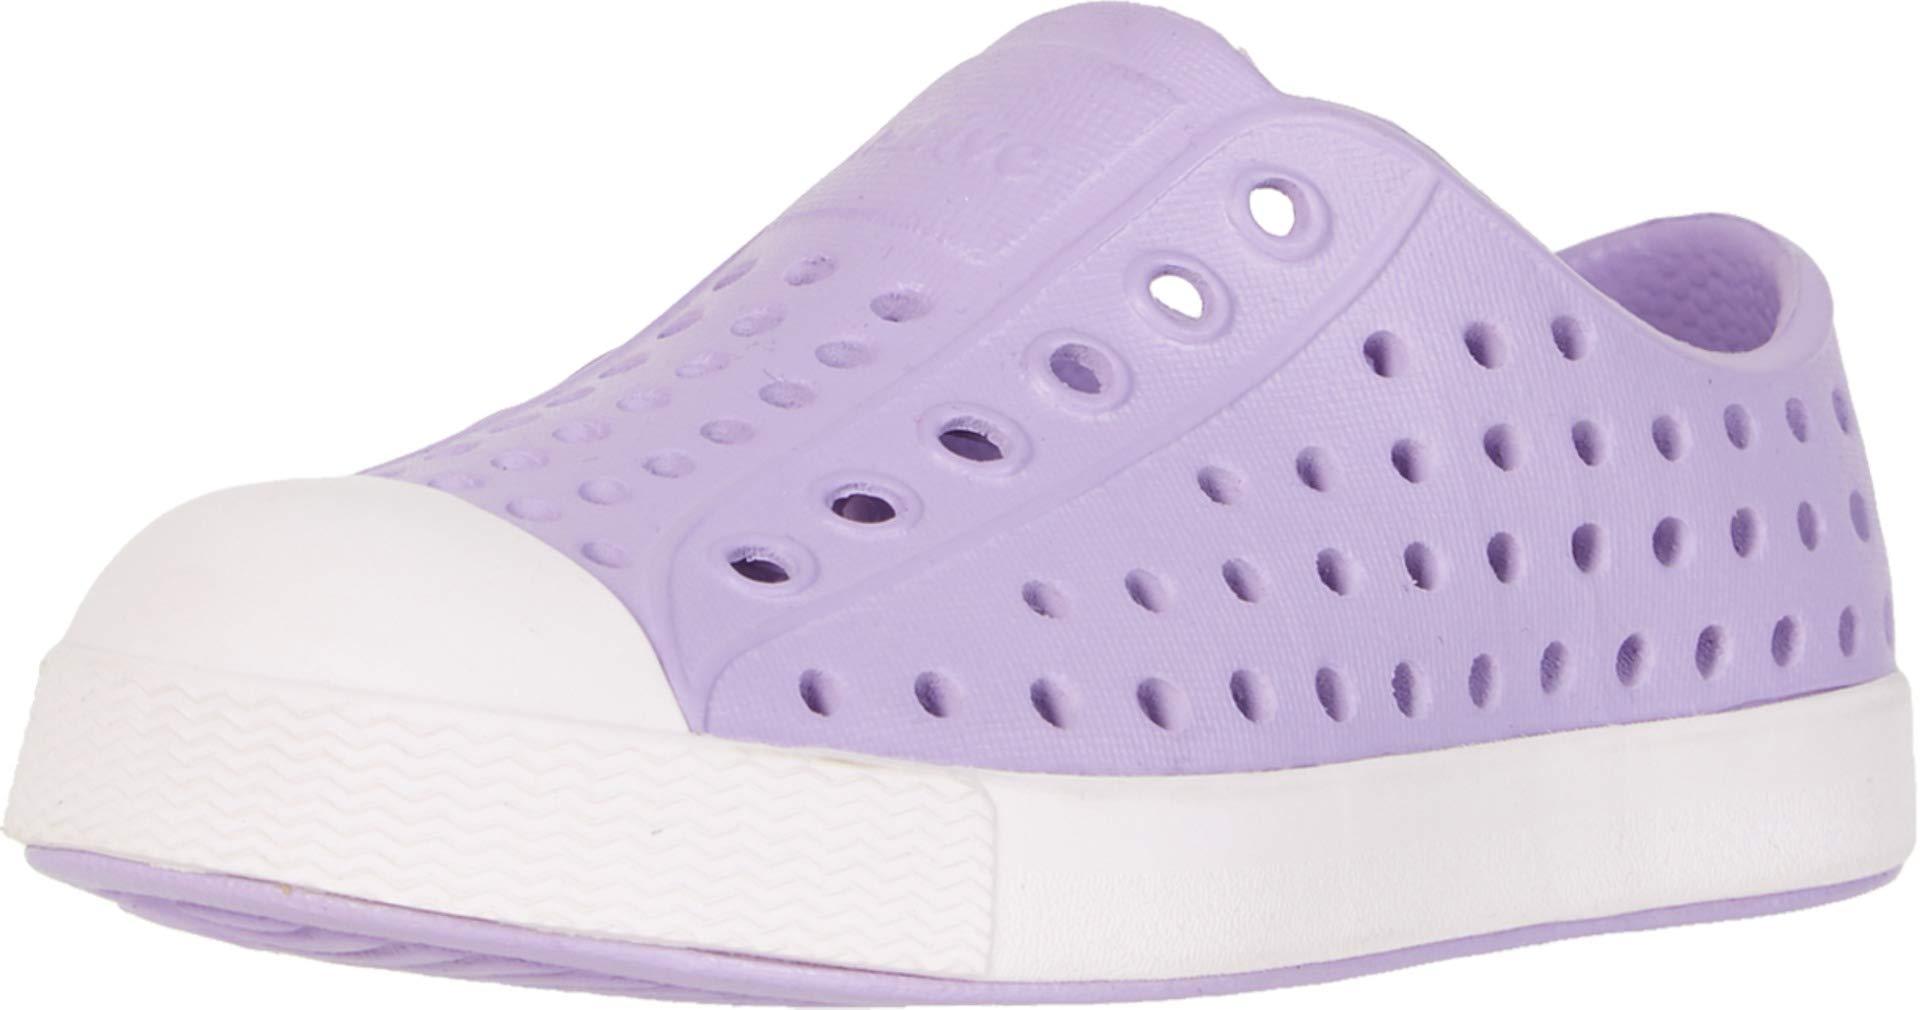 Native Kids Shoes Baby Girl's Jefferson (Toddler/Little Kid) Lavender Purple/Milk Pink 5 M US Toddler